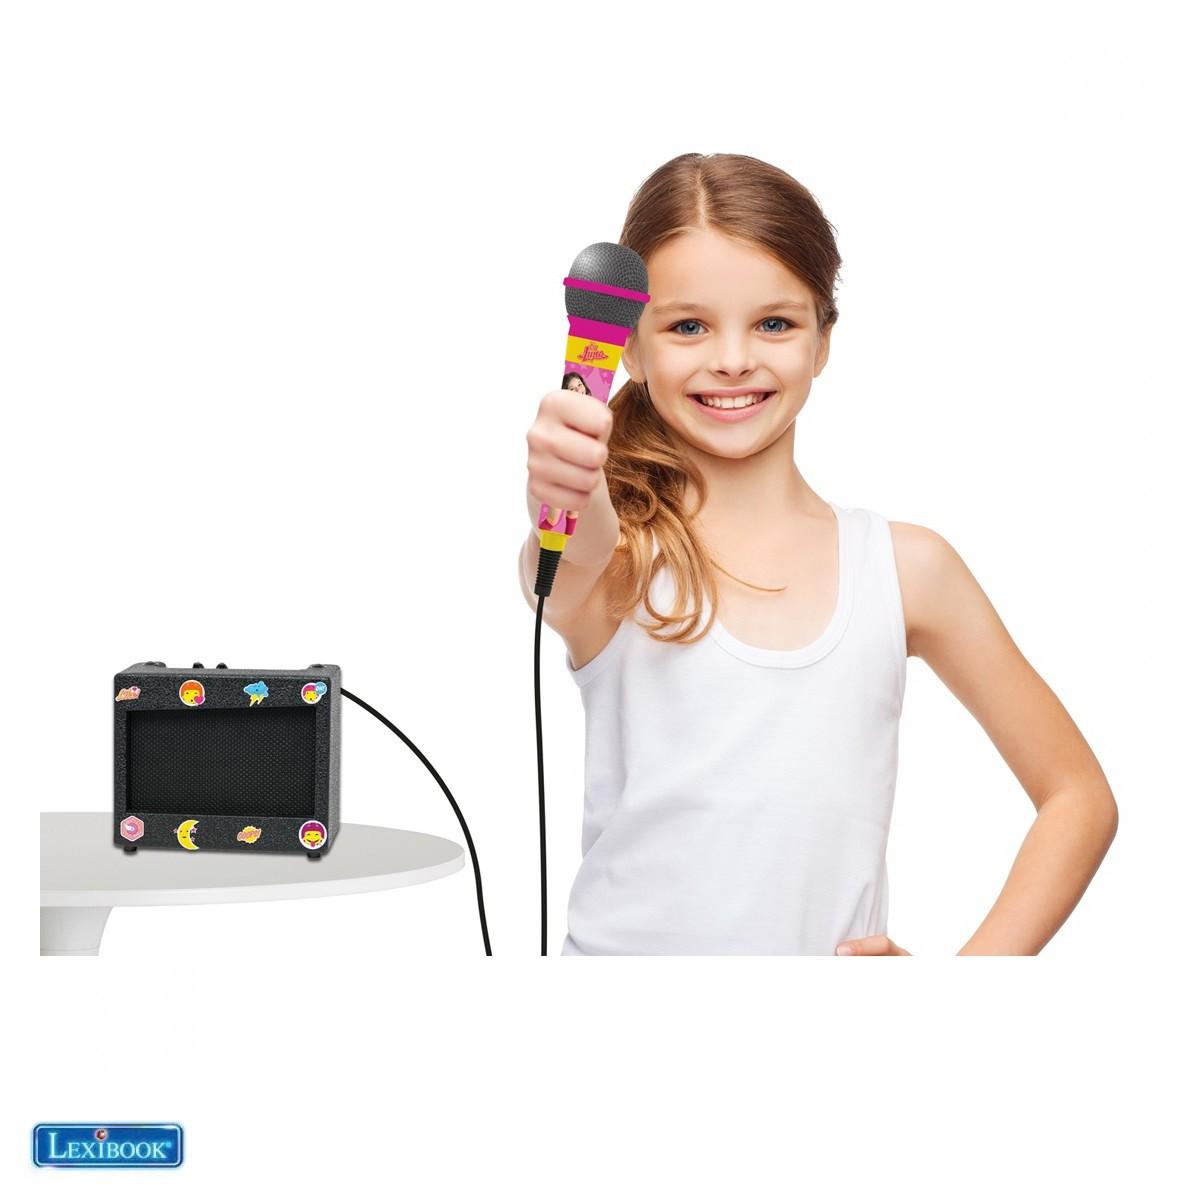 Ampli et micro Soy Luna - K900SL - Lexibook